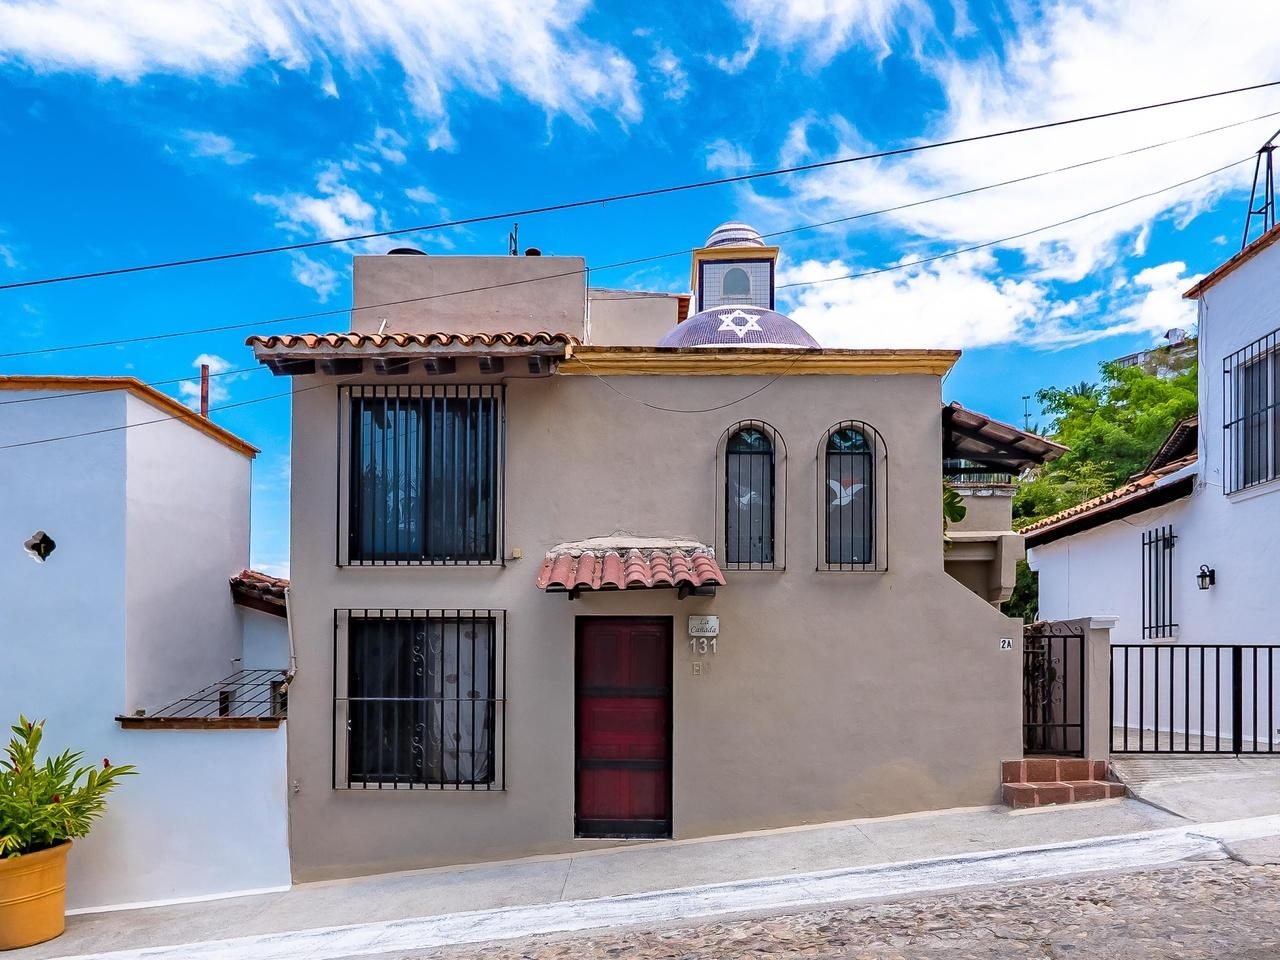 La Cañada Casa 2